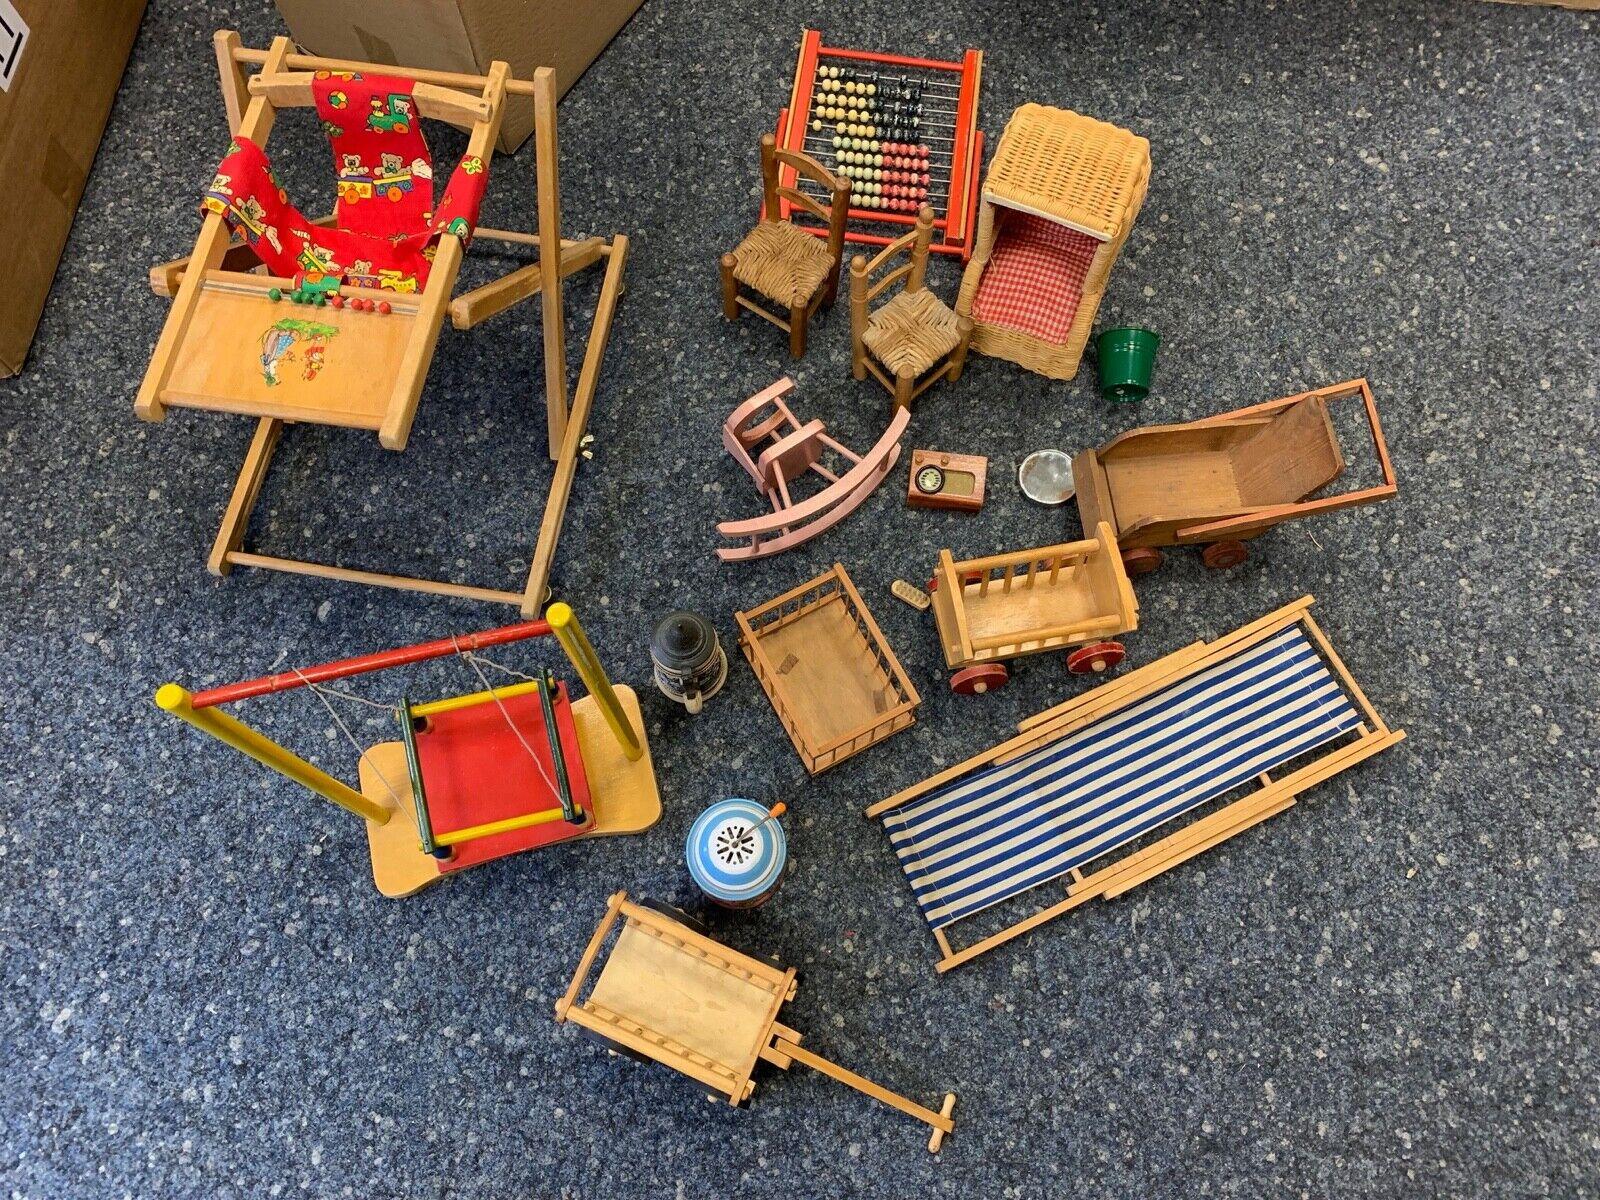 Spielzeug Holzspielzeug Konvolut. Puppenmöbel. Siehe Fotos